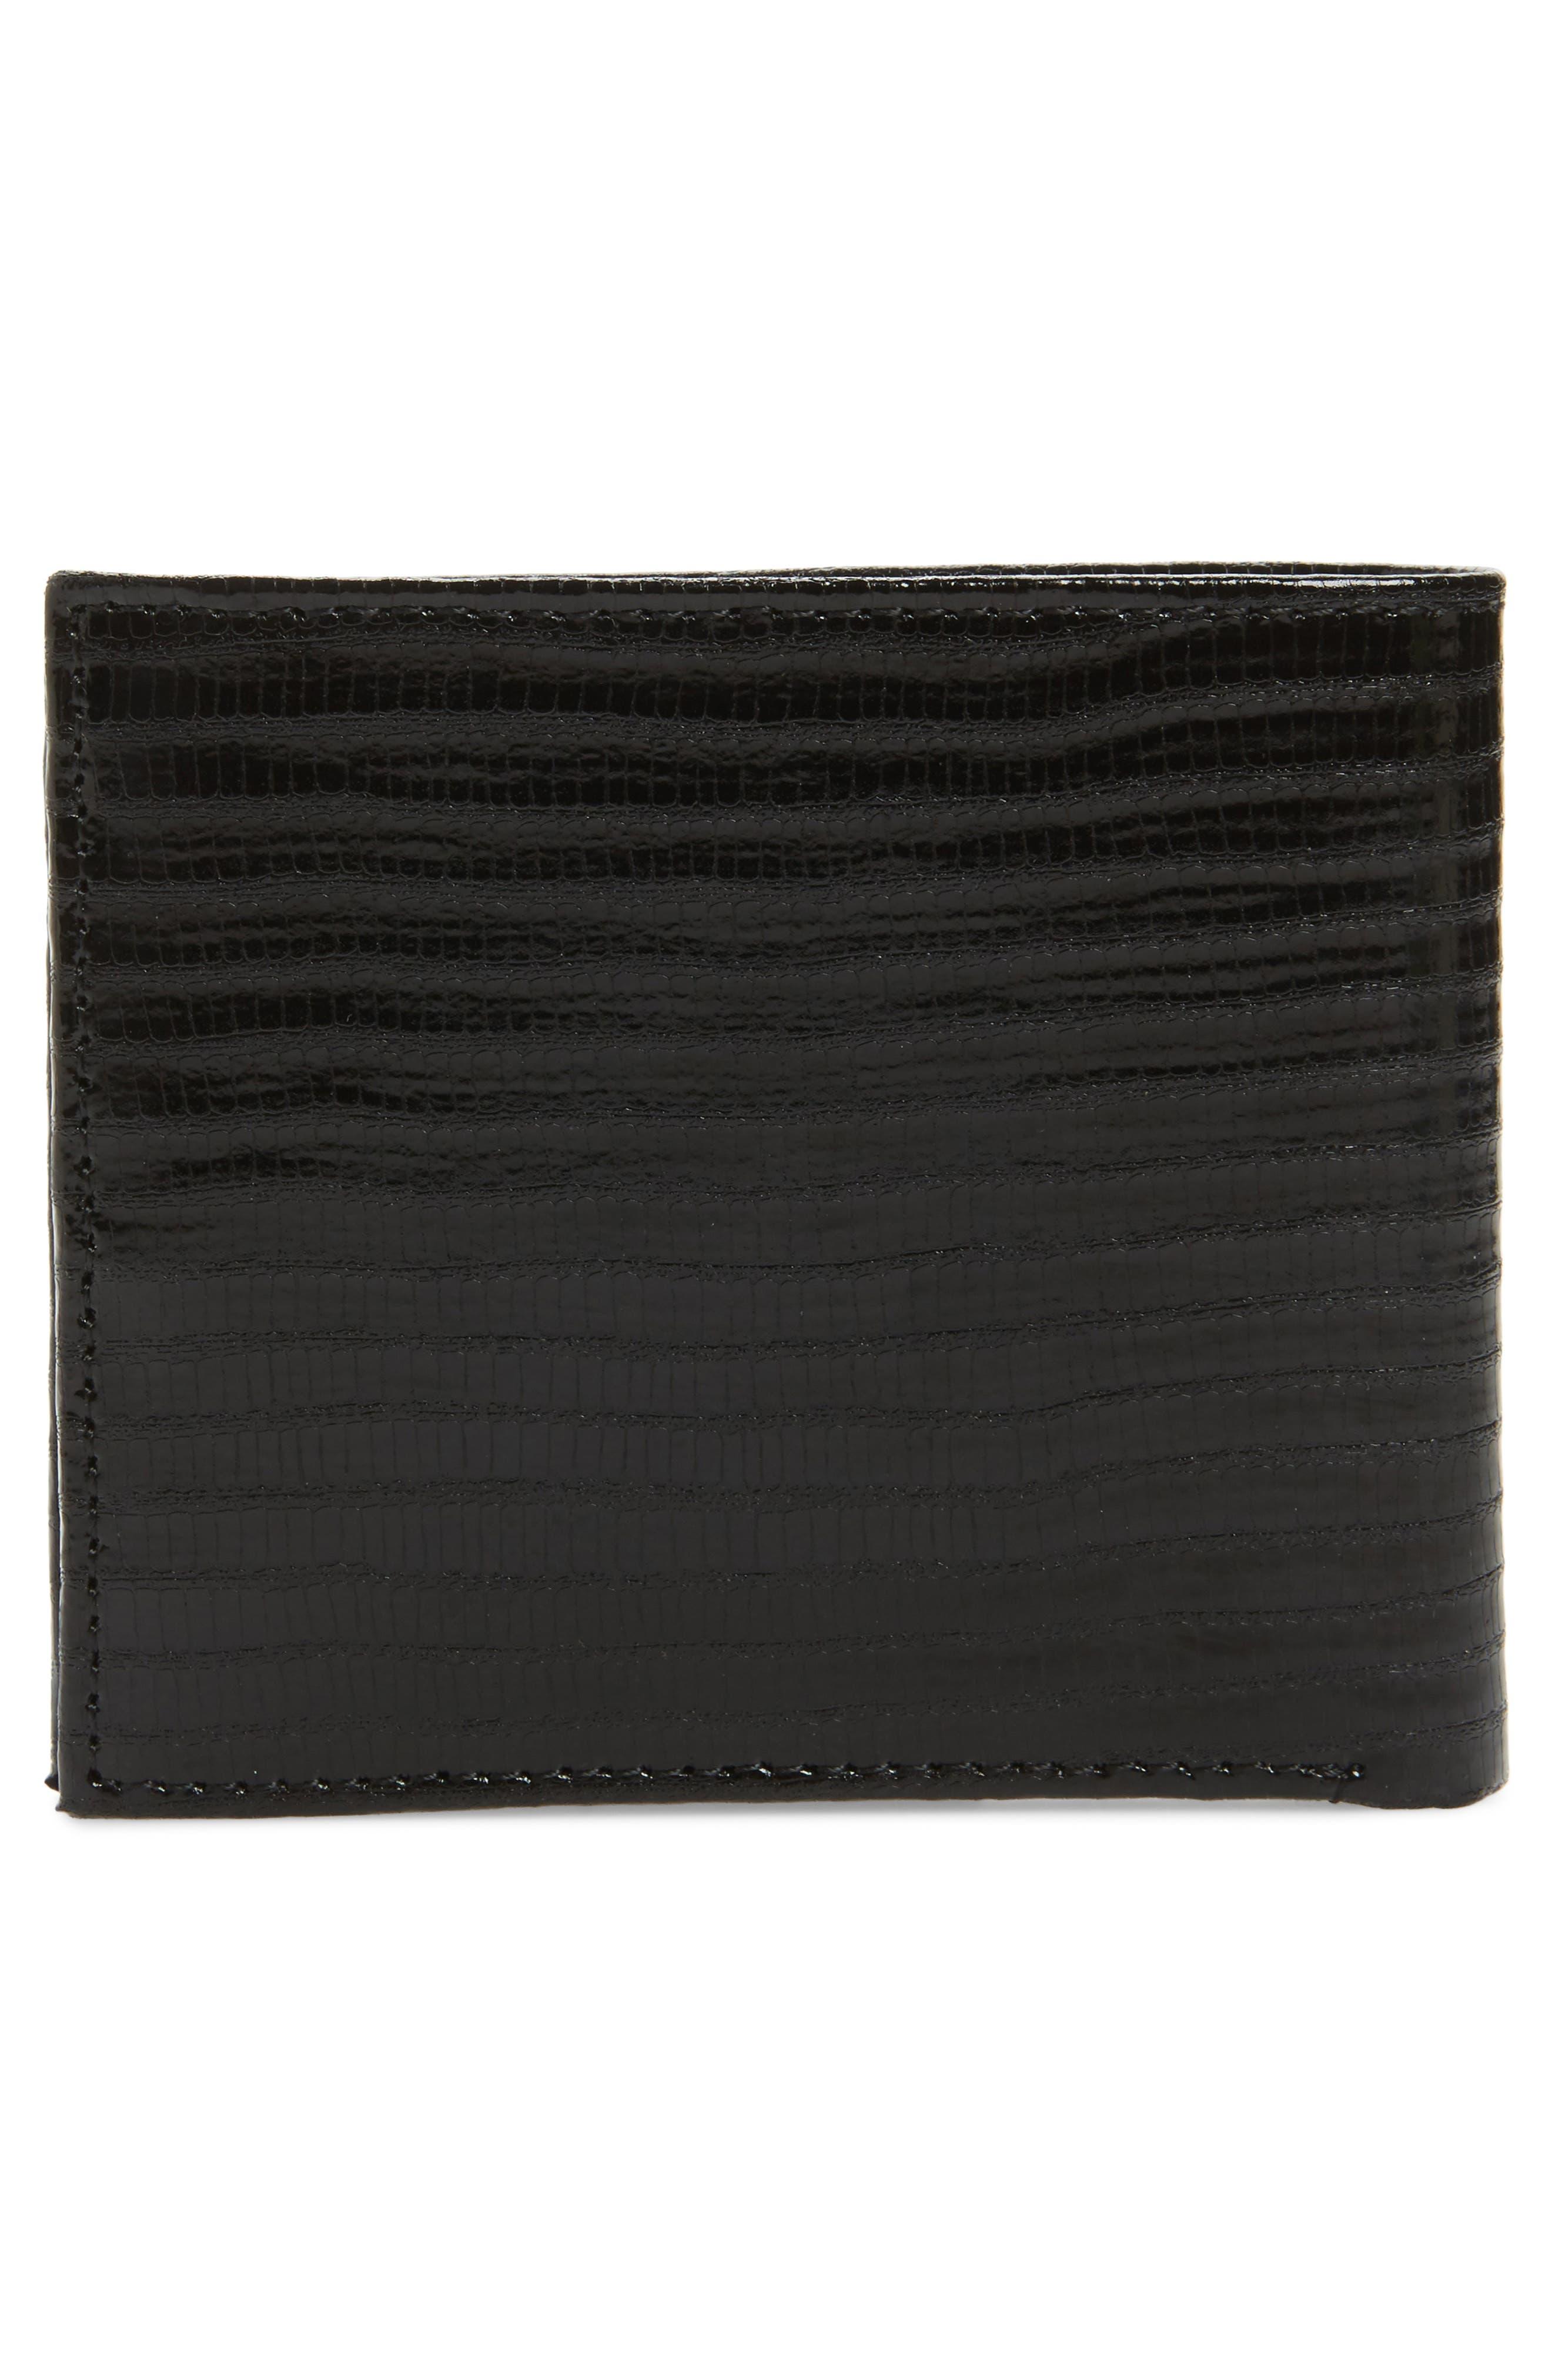 Slayts Leather Wallet,                             Alternate thumbnail 3, color,                             001